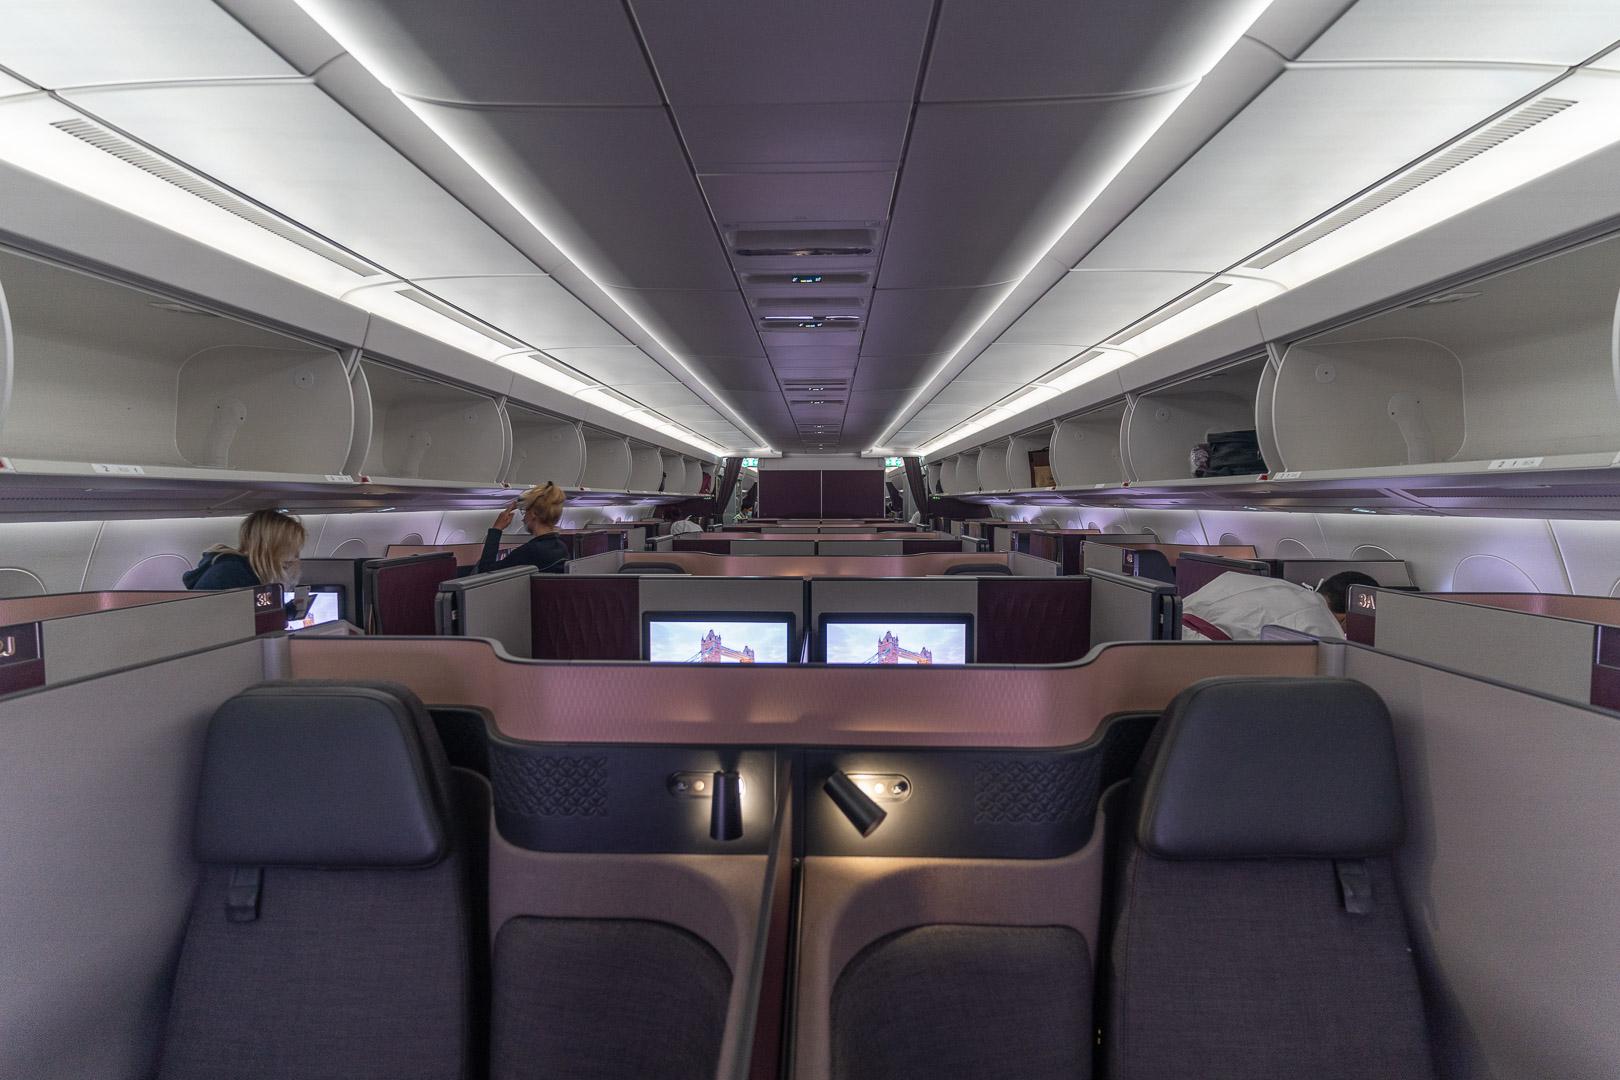 q suites covid 46 - REVIEW - Qatar Airways : Q Suites - B777/A350 - Malé (MLE) to London (LHR) - [COVID-era]